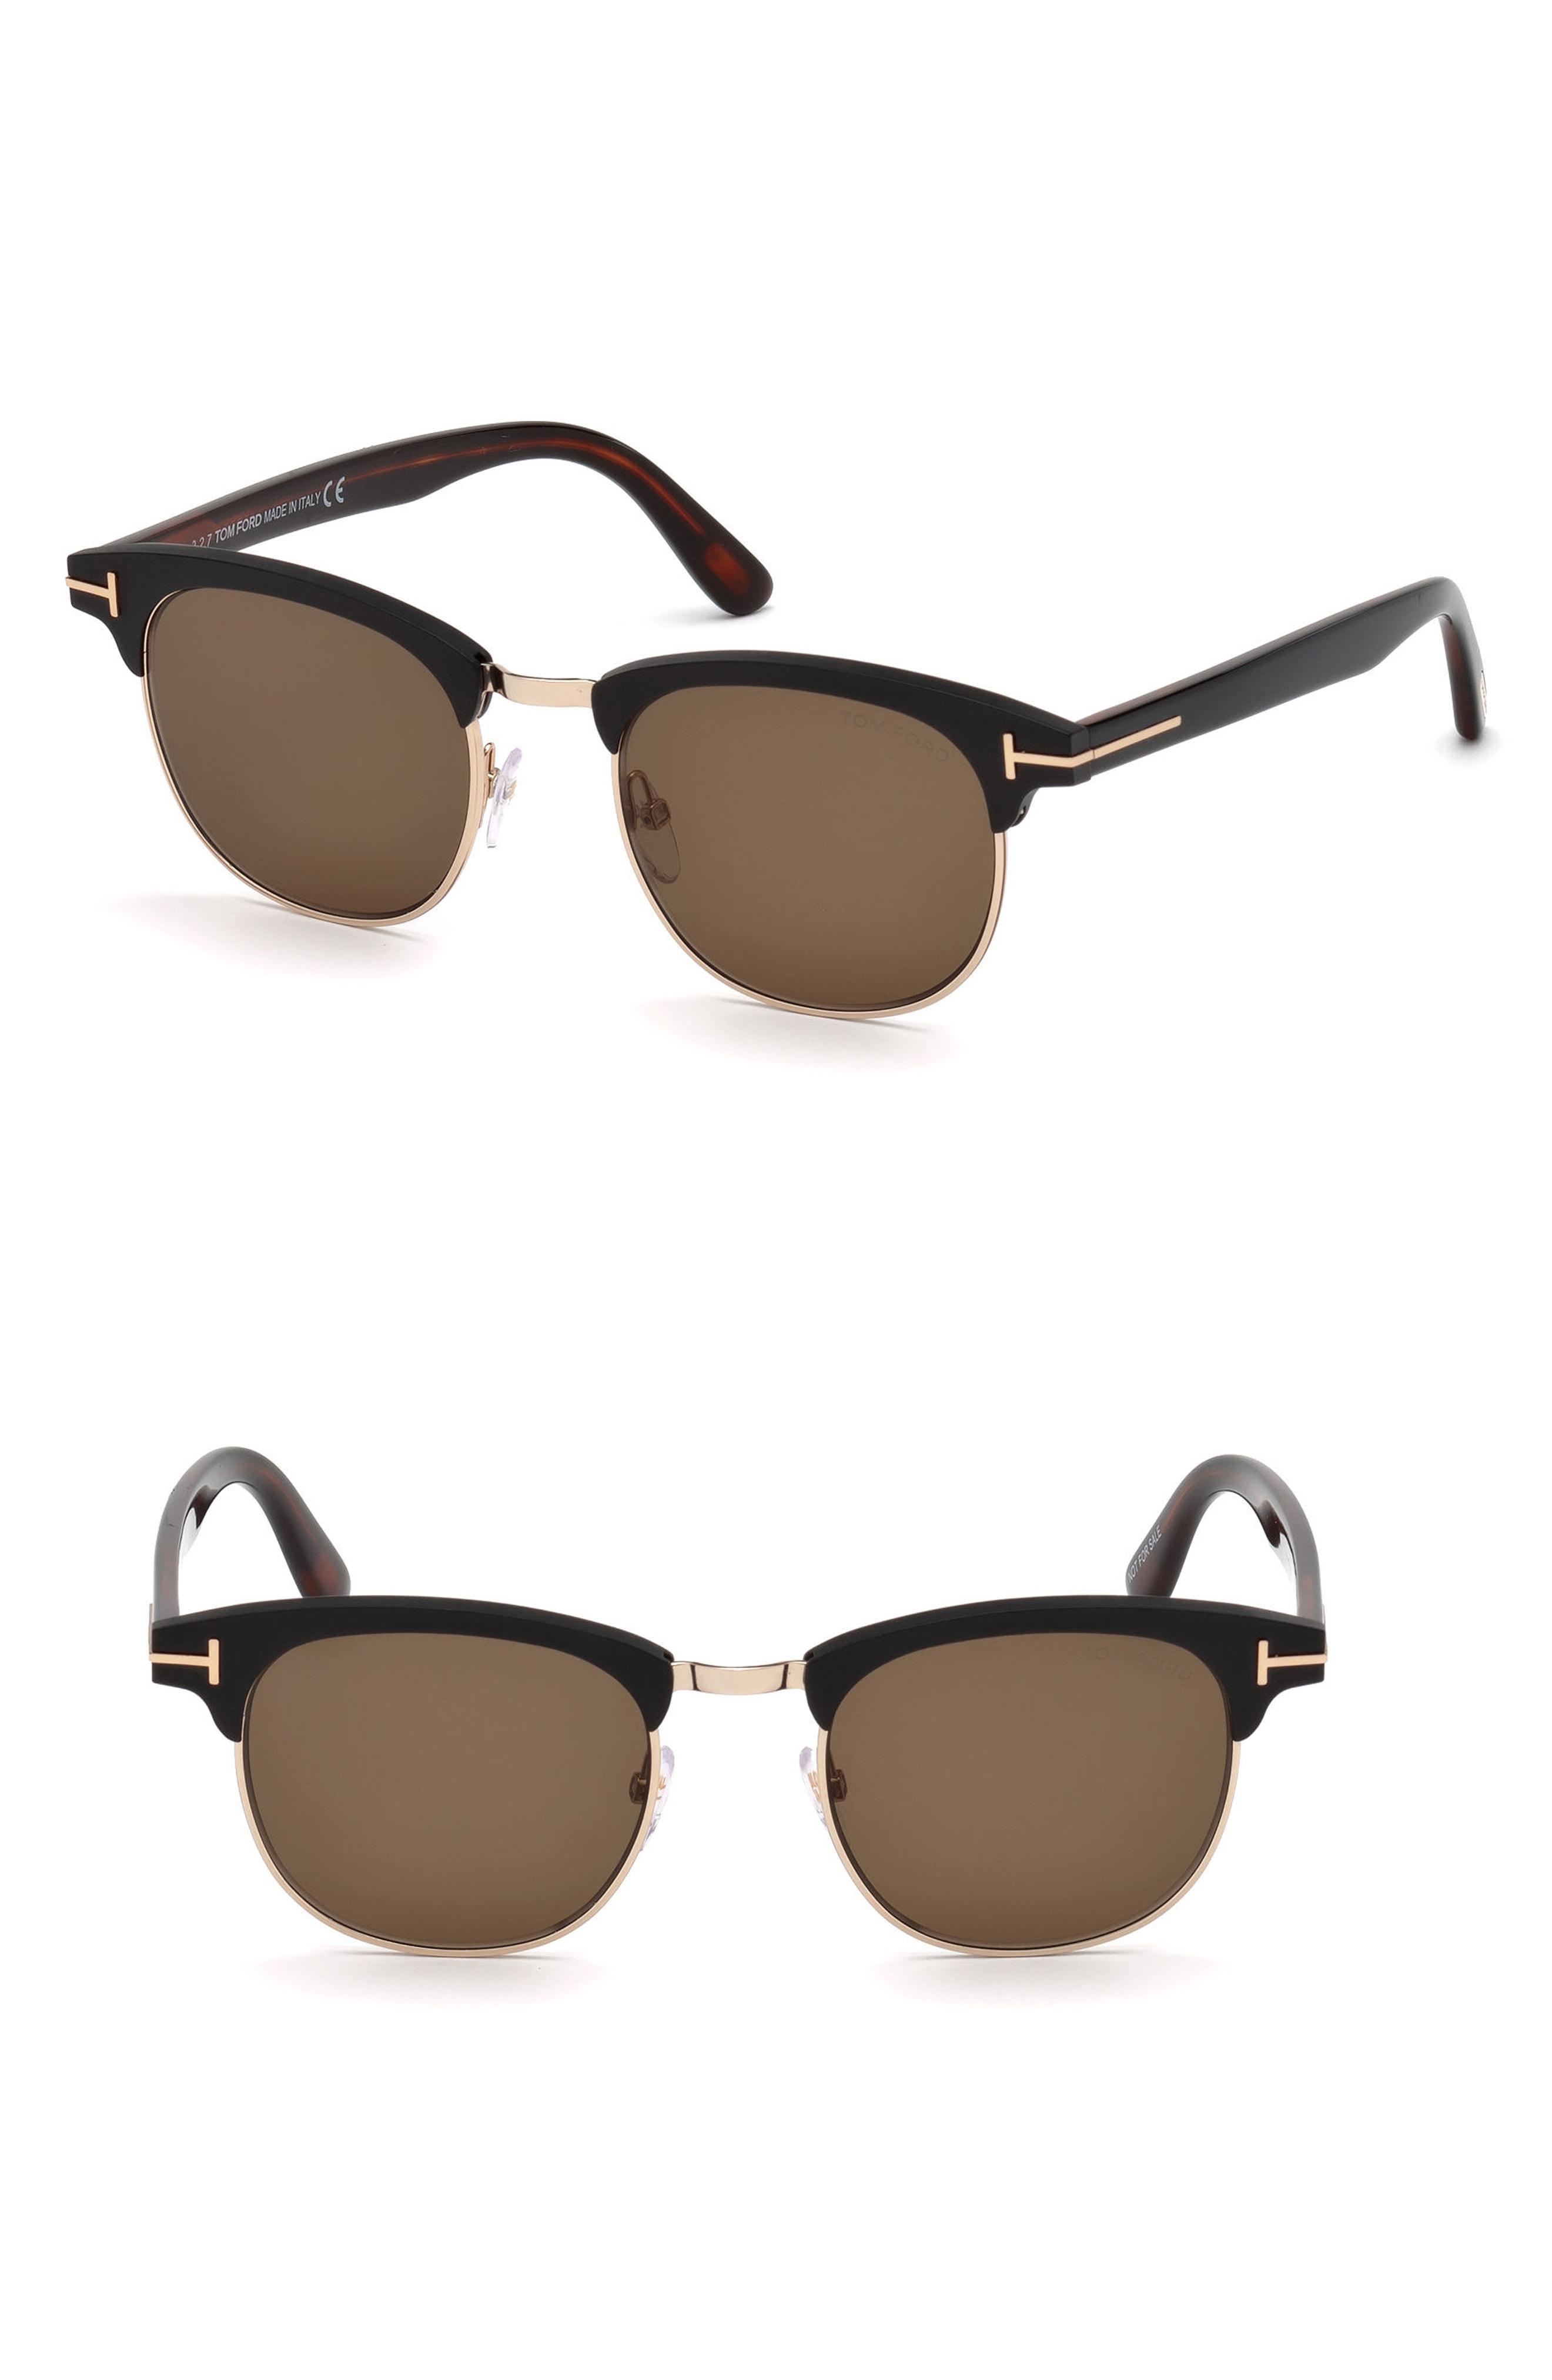 5255bf68a2f Lyst - Tom Ford Laurent 51mm Sunglasses for Men